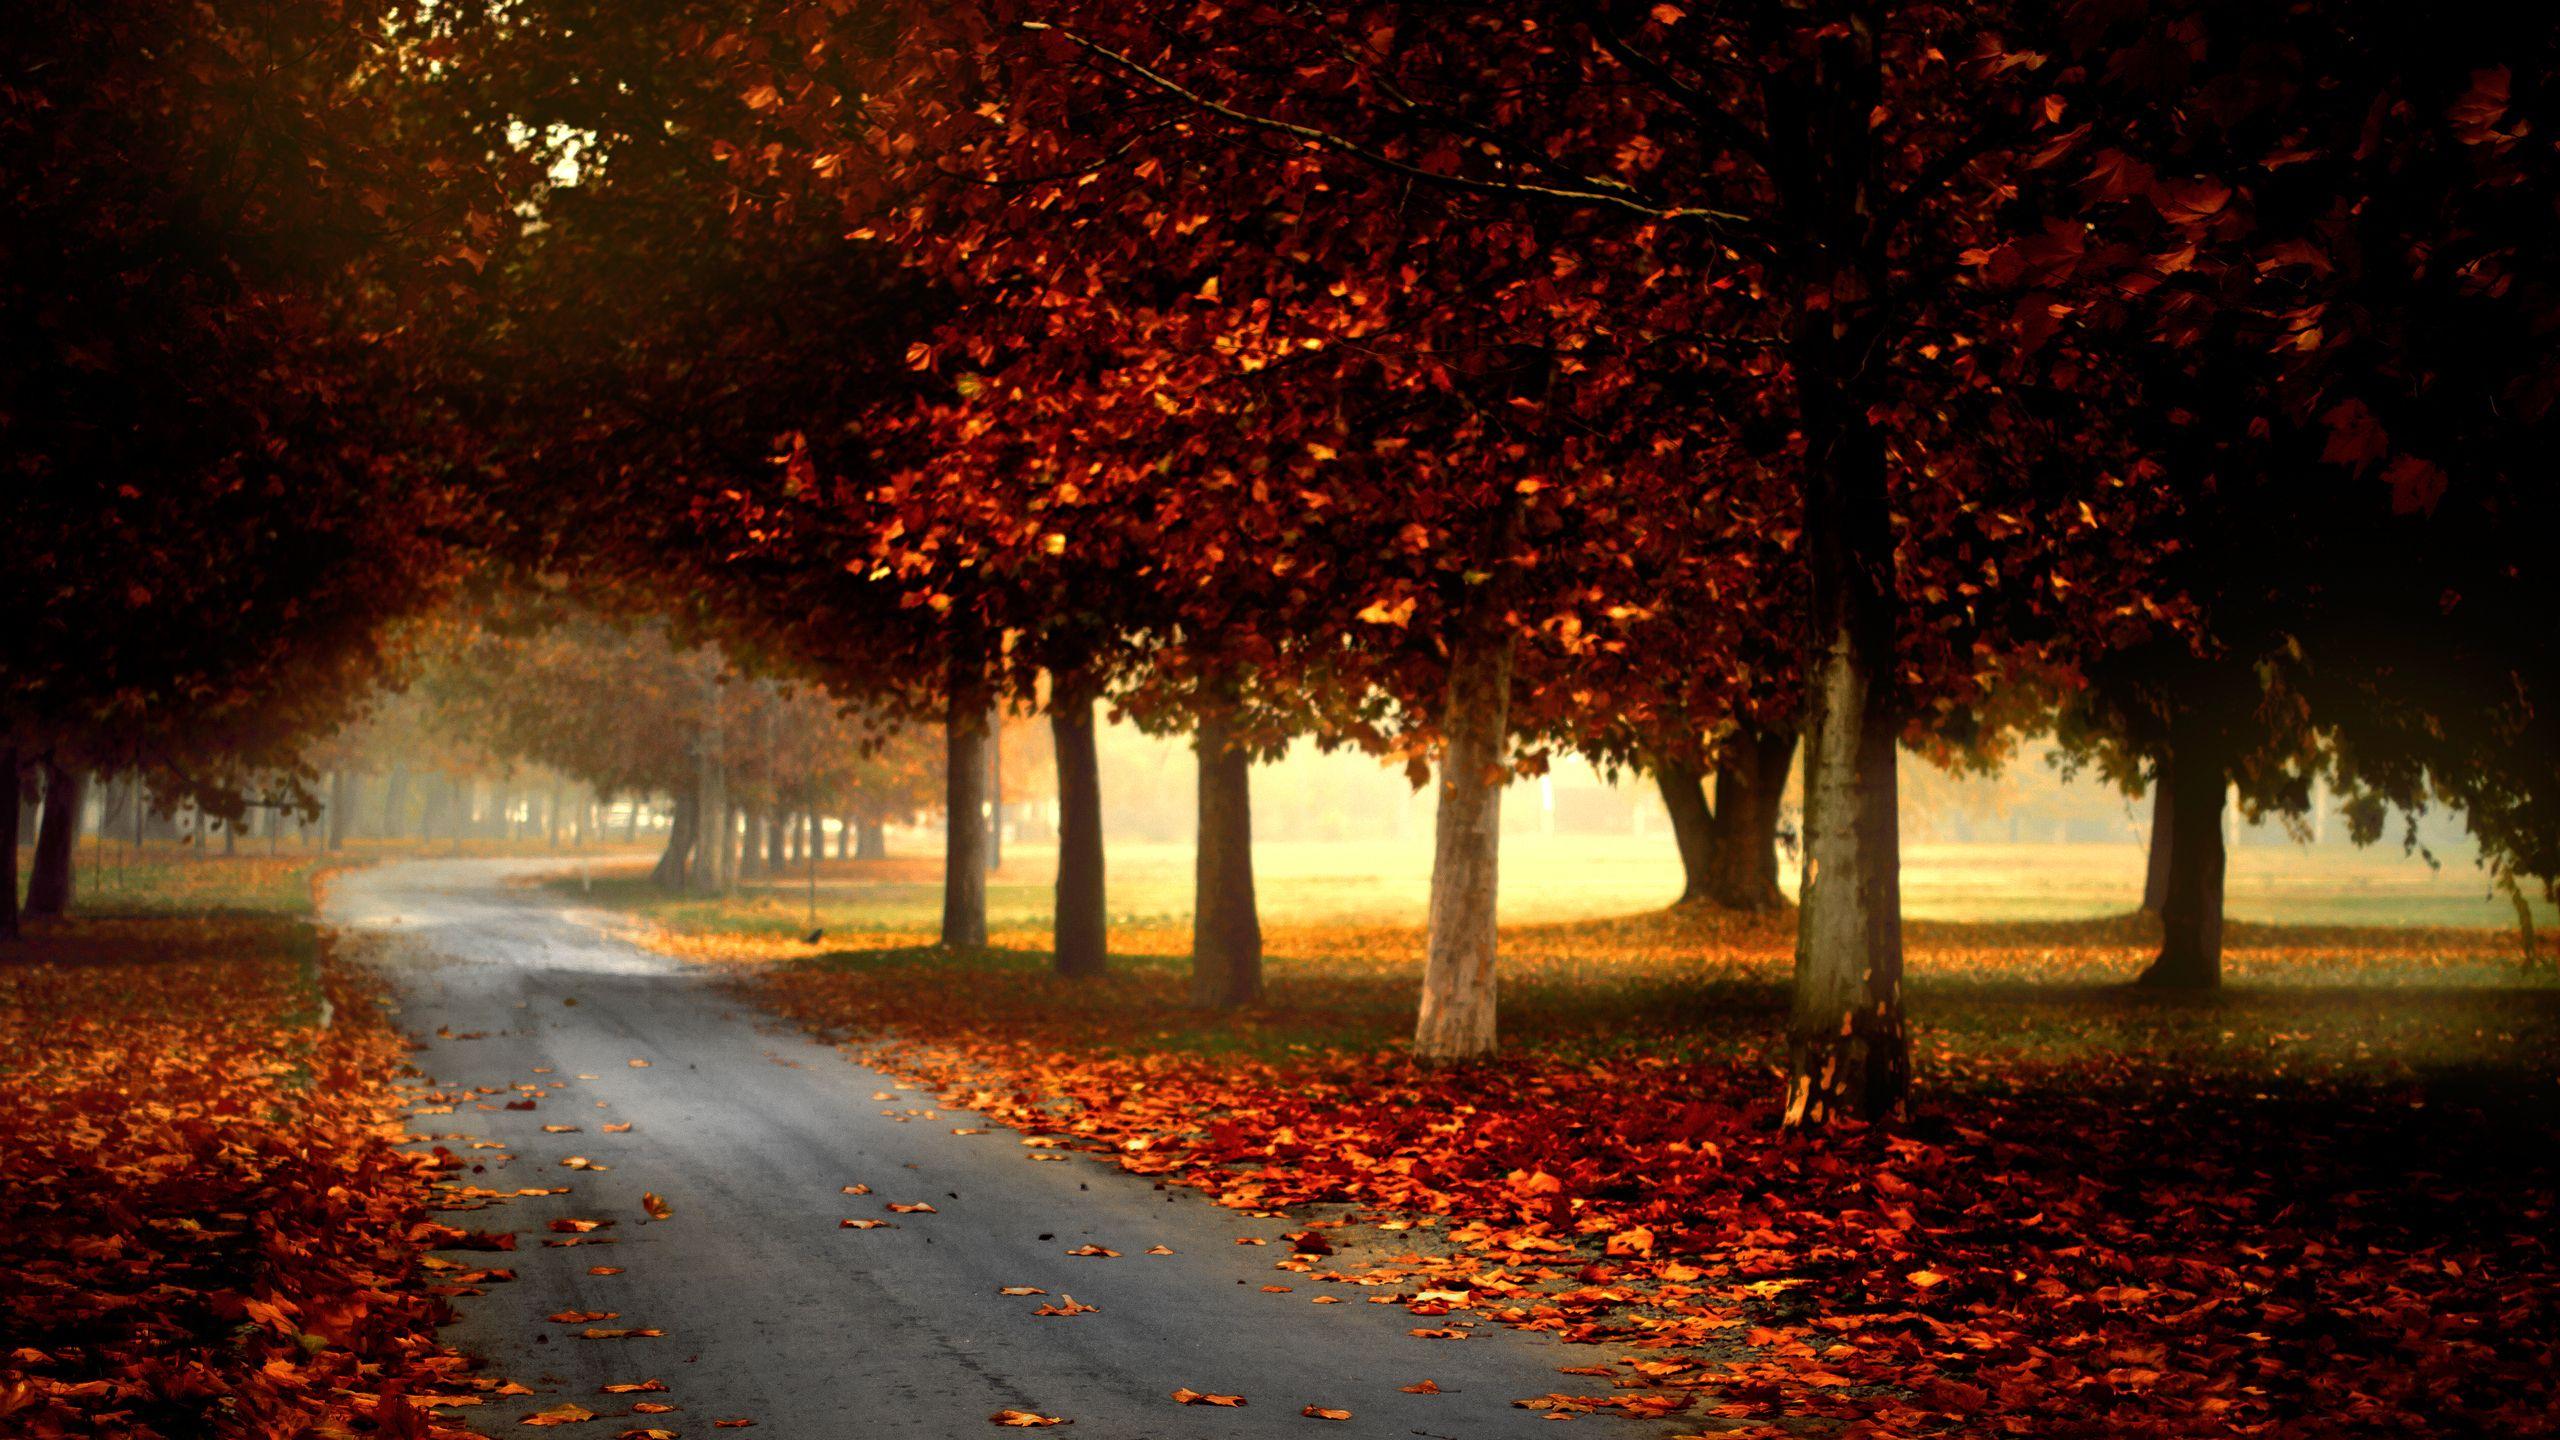 Country Road In Autumn Wallpaper Autumn Wallpaper Hd Landscape Wallpaper Forest Landscape